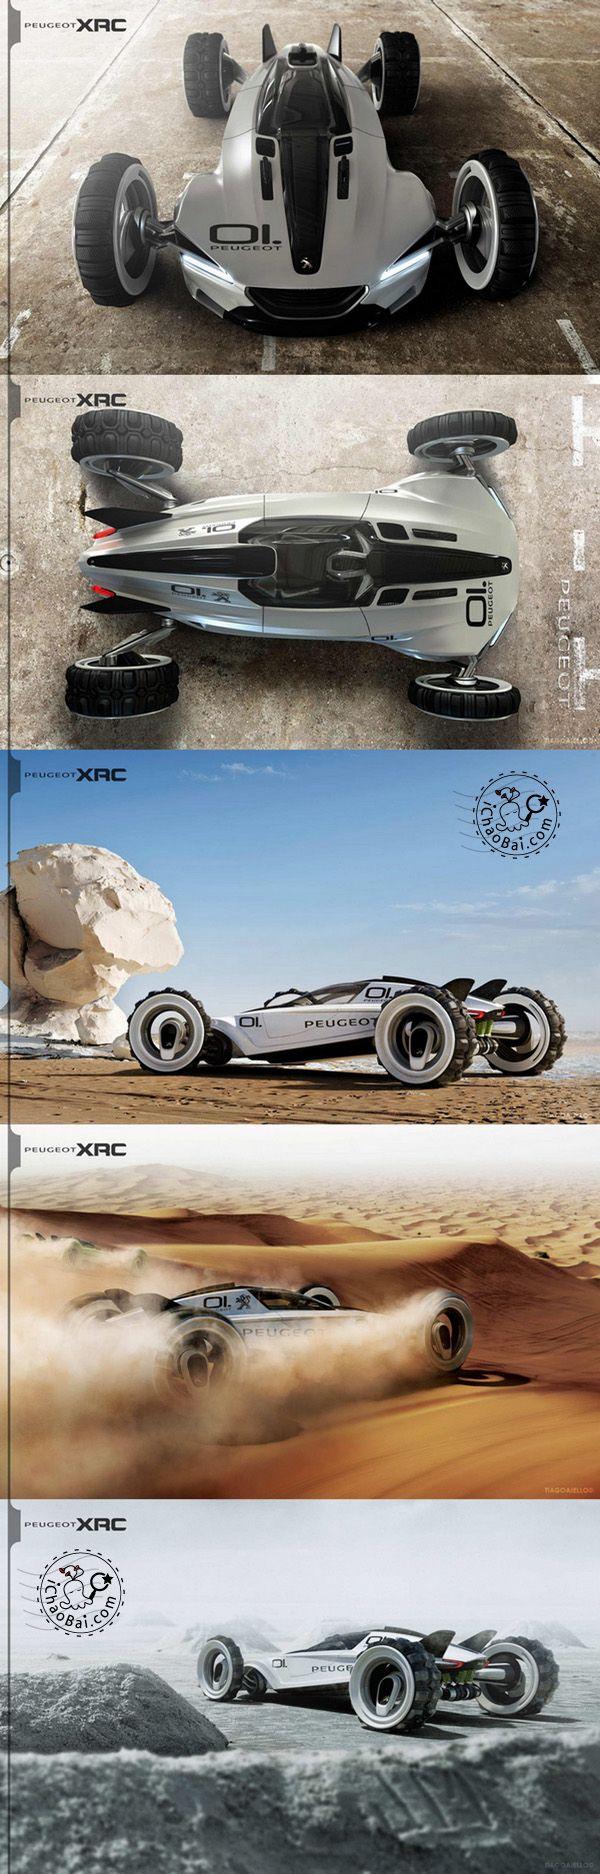 Peugeot XRC Concept car